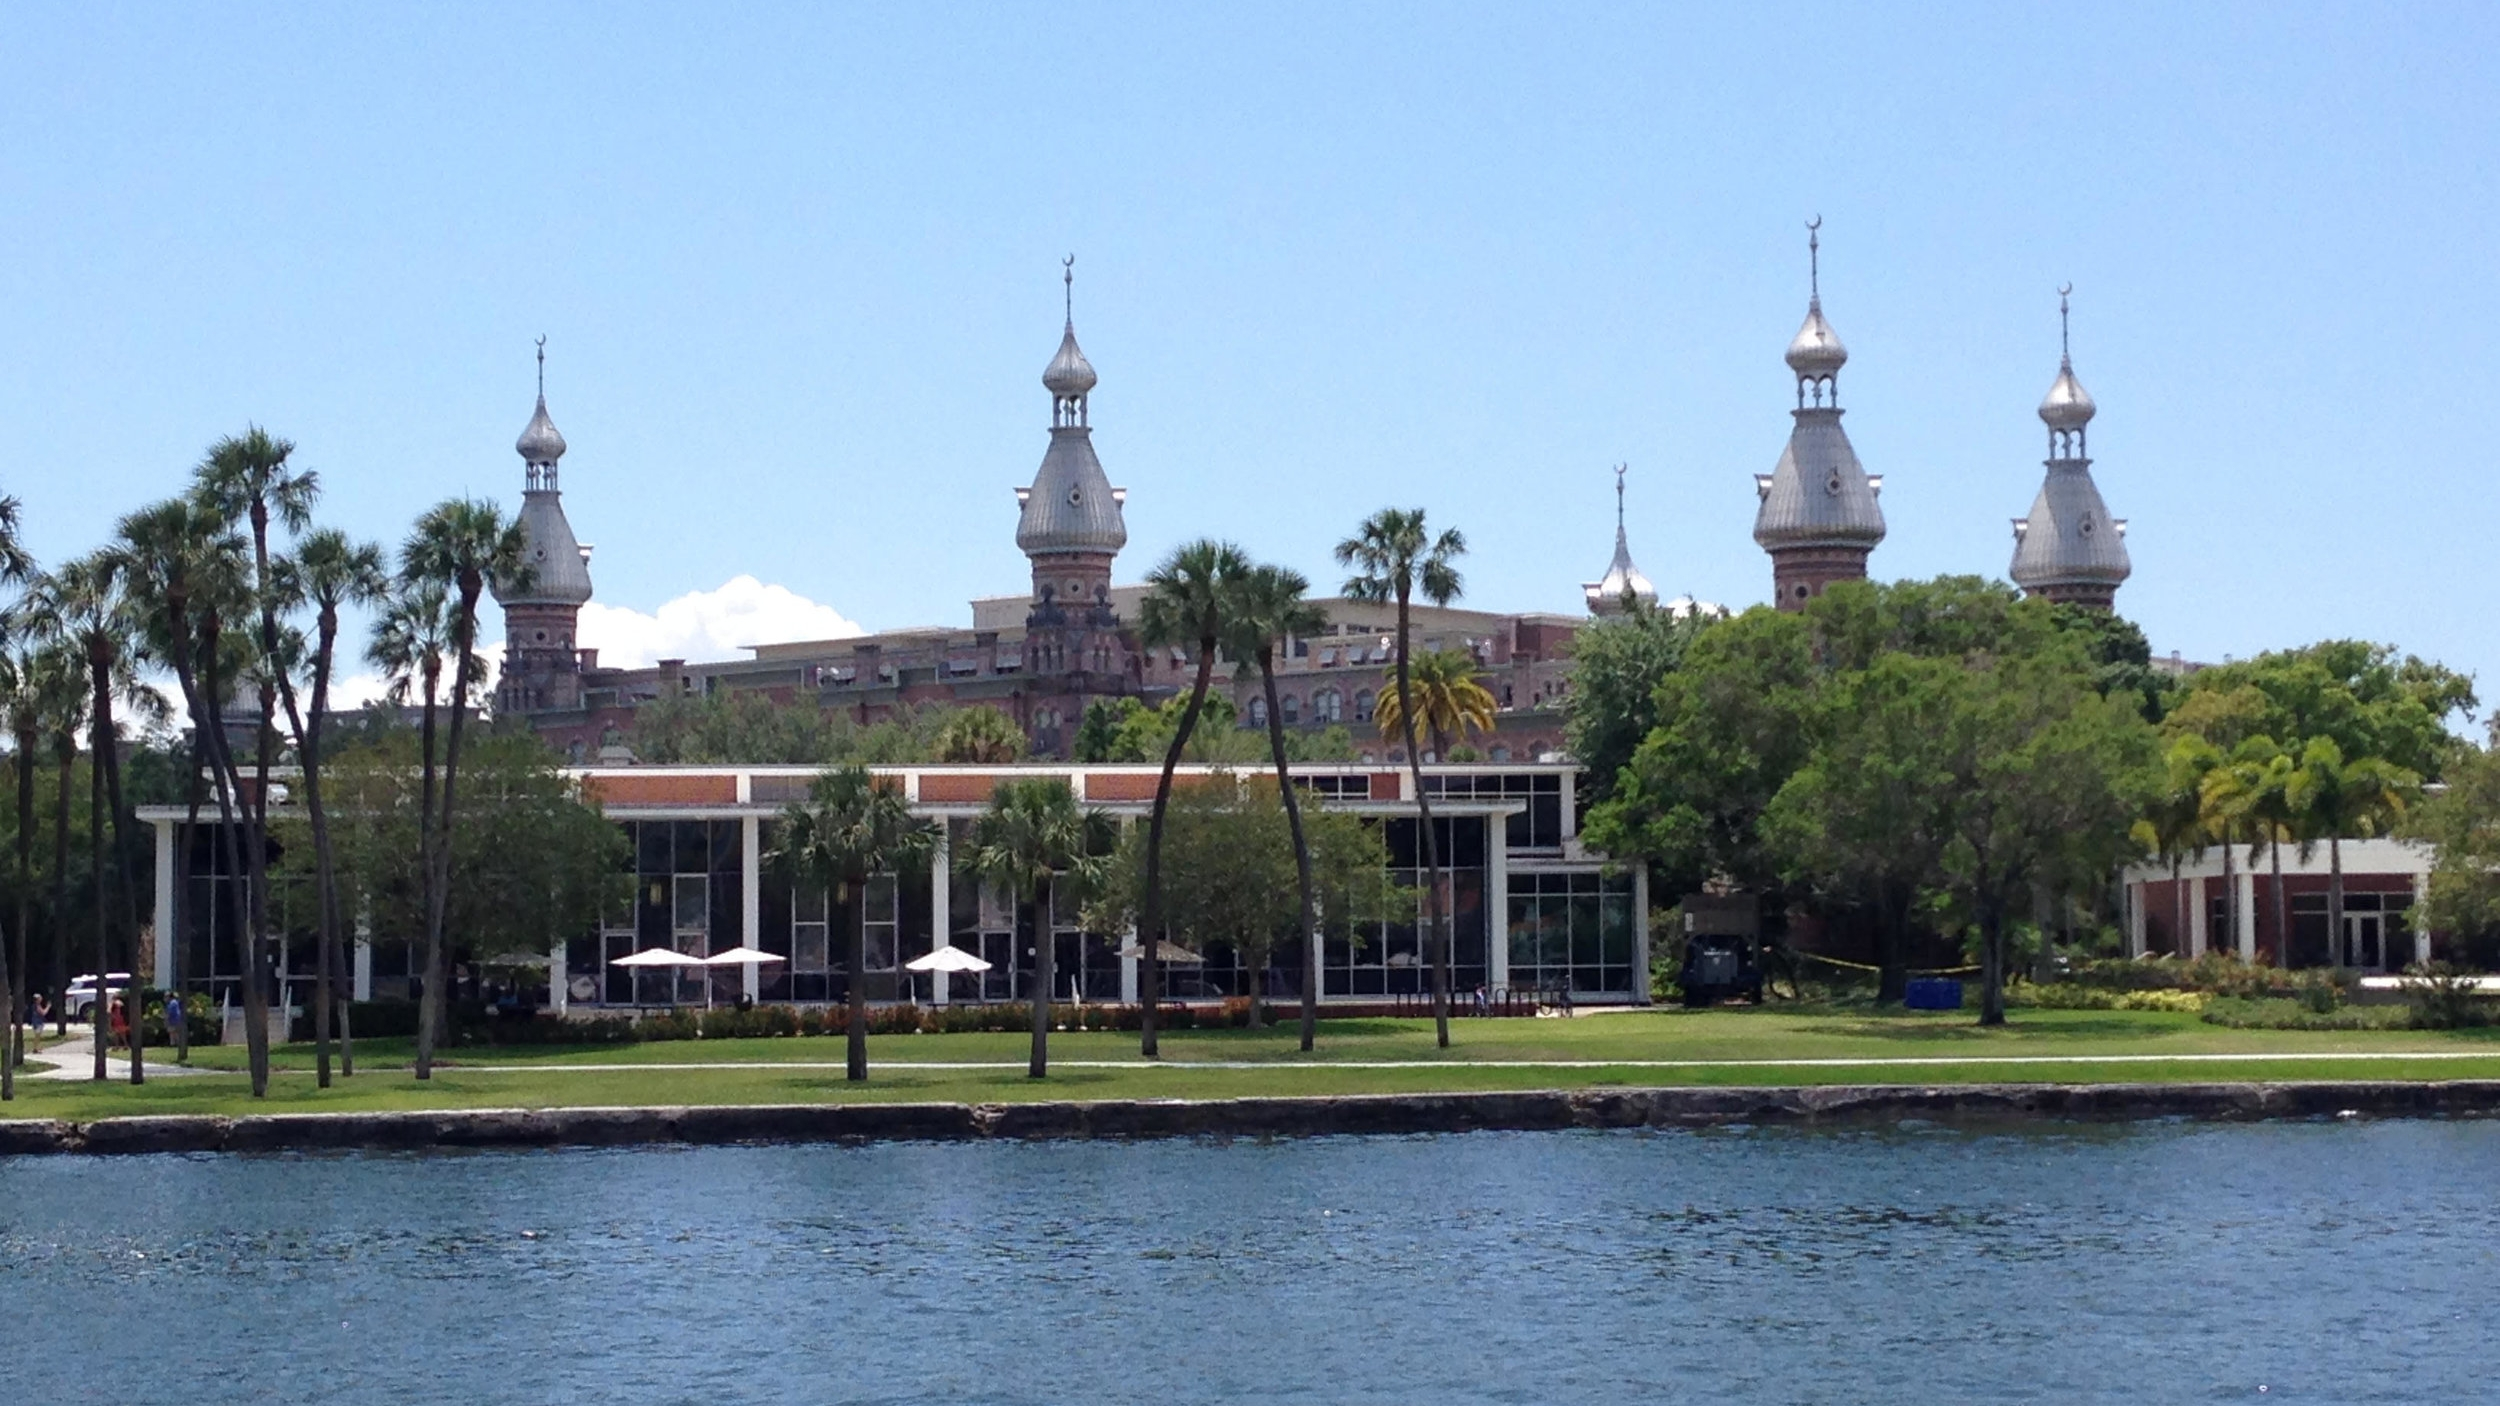 The beautiful University of Tampa